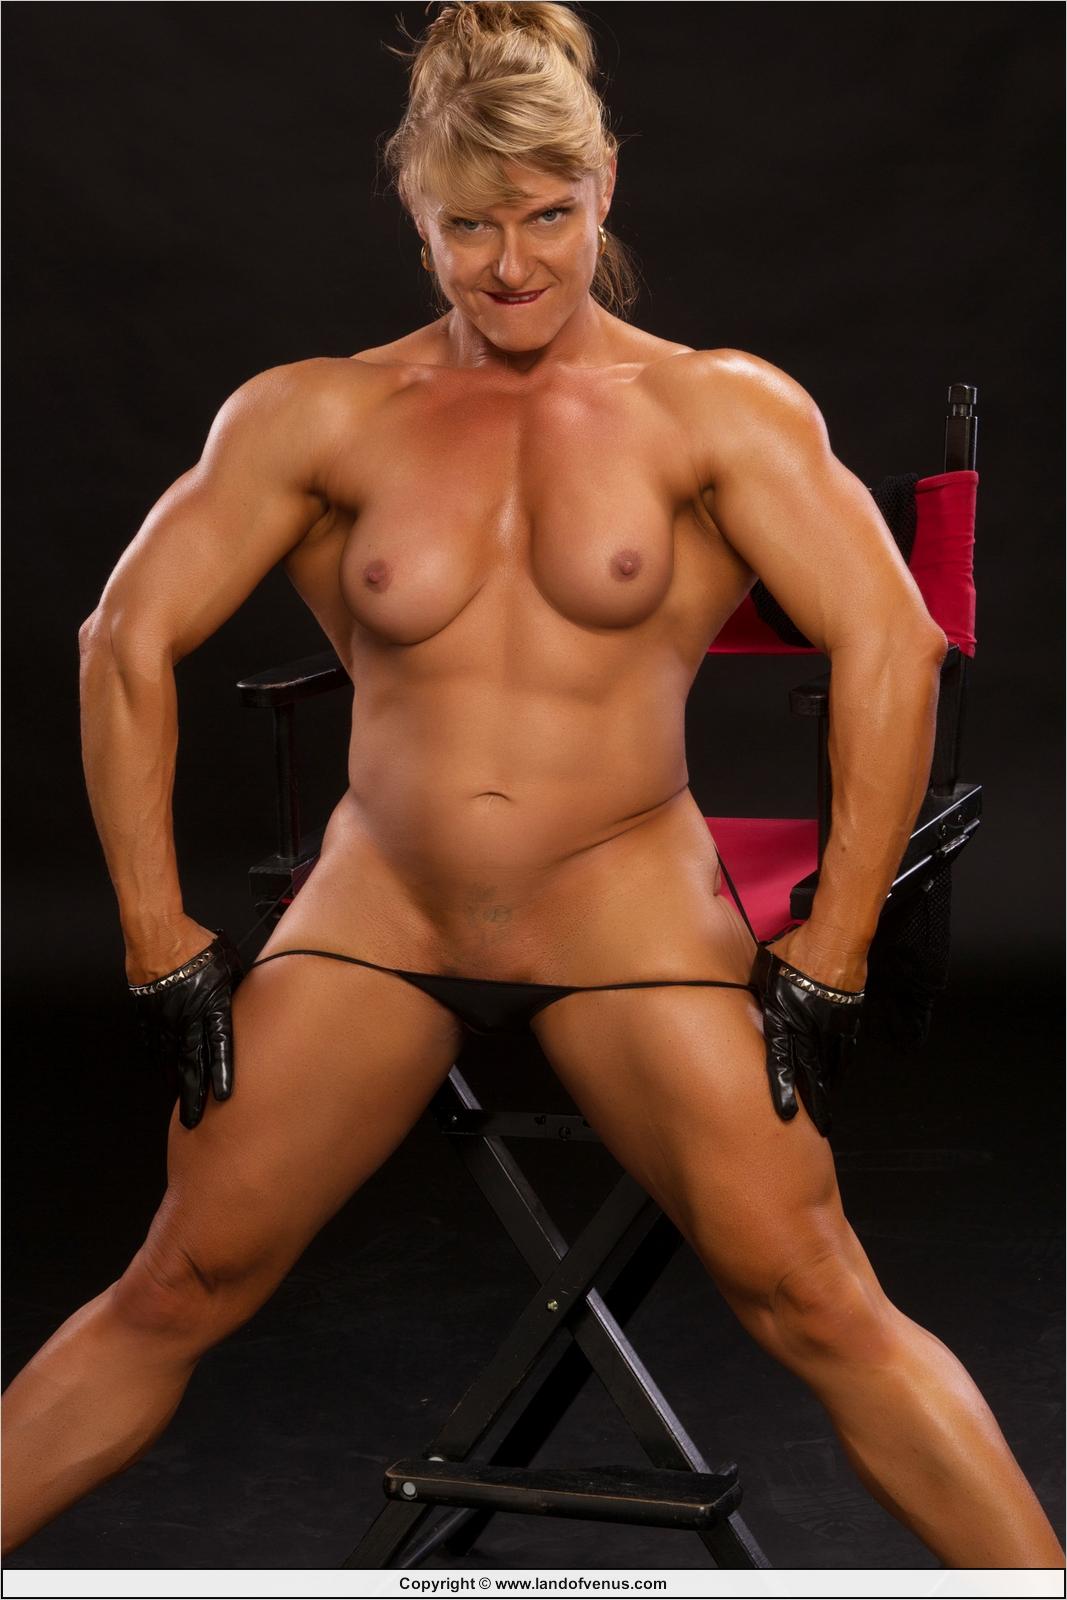 Eroticmusclevideos big black cock versus big muscular clit - 1 7